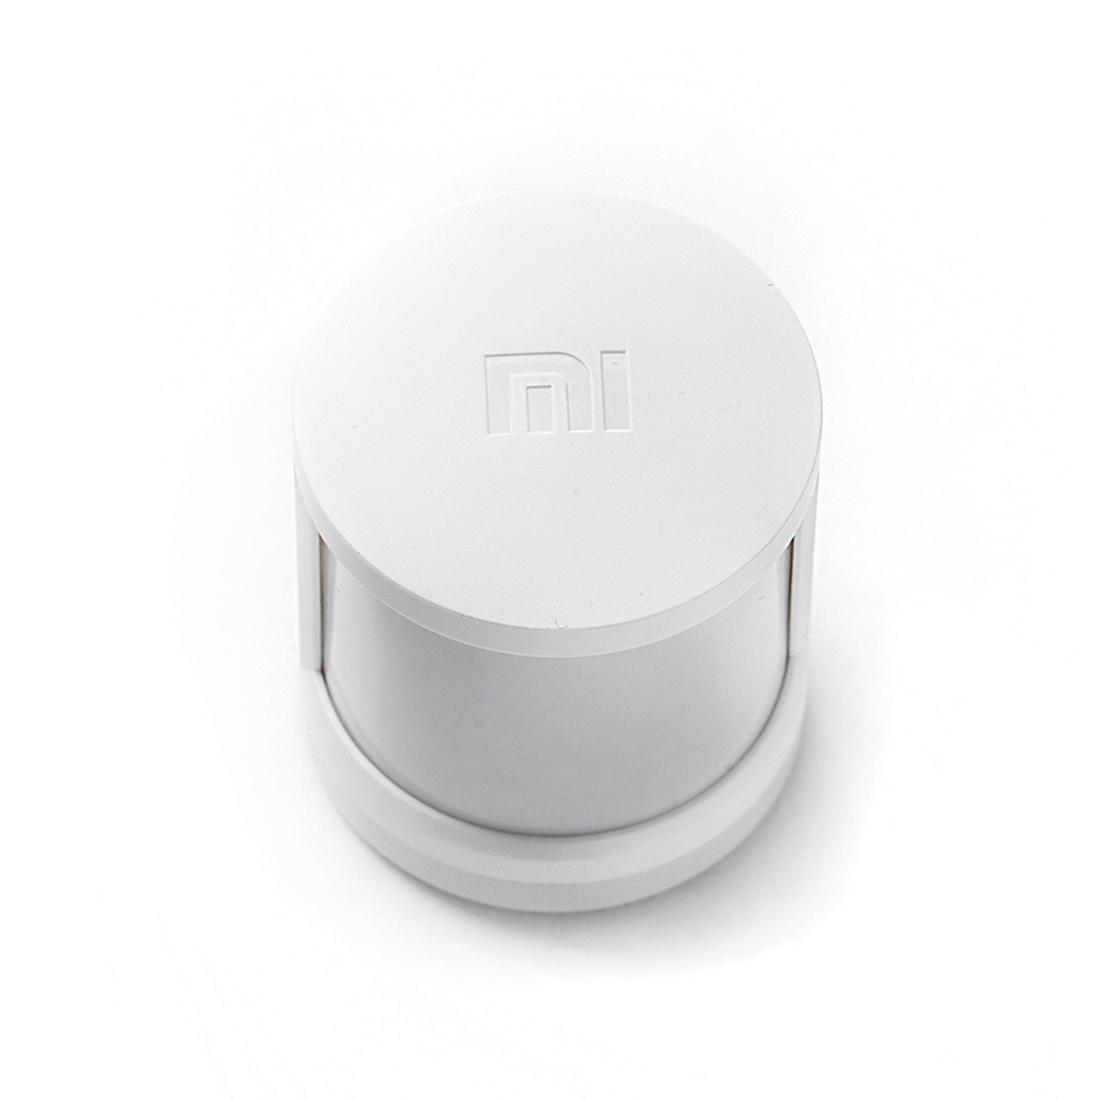 Датчик движения Mi Smart Home(ZHTZ05LM) Белый